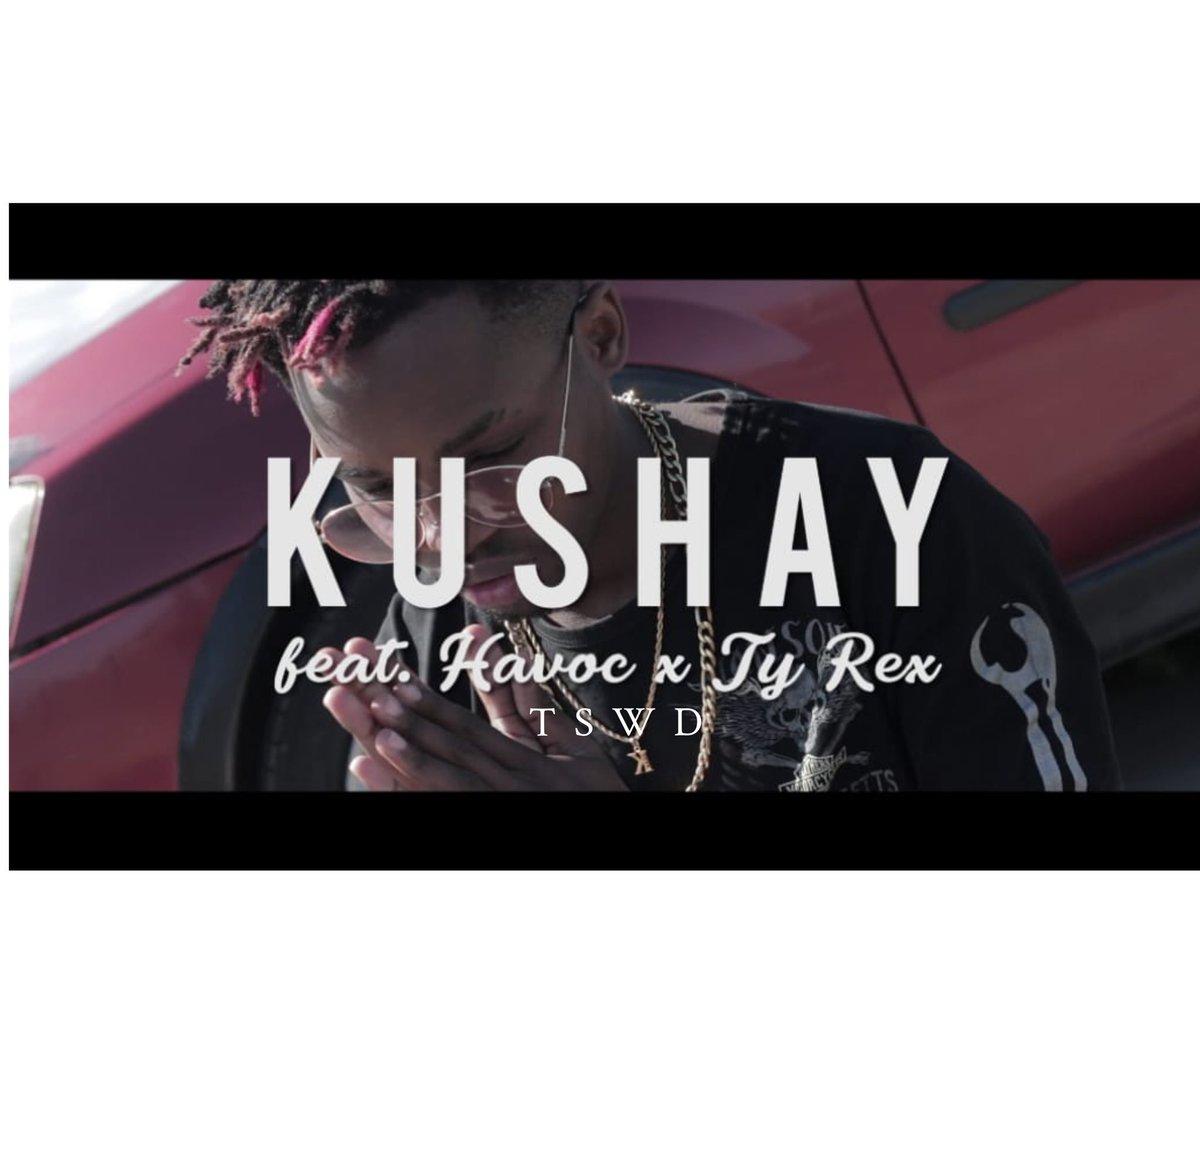 [Click The Link Below] RT  https://audiomack.com/song/sibo-1/kushay-tswd-feat-rick-havoc-ty-rex…  KushAy - TSWD Feat. Rick Havoc ZA & Ty Rex Makhalima   🚨 OUT NOW!!! 🚨  #OGK #RedG 🌊🌊🌊🌊🌊 @Lihle30940725 @_ArtistRack @Mr_LordChris @A1_lilflame @globalSIBO @Havoc_EC @TyRex_EC @Twitta_Makiya